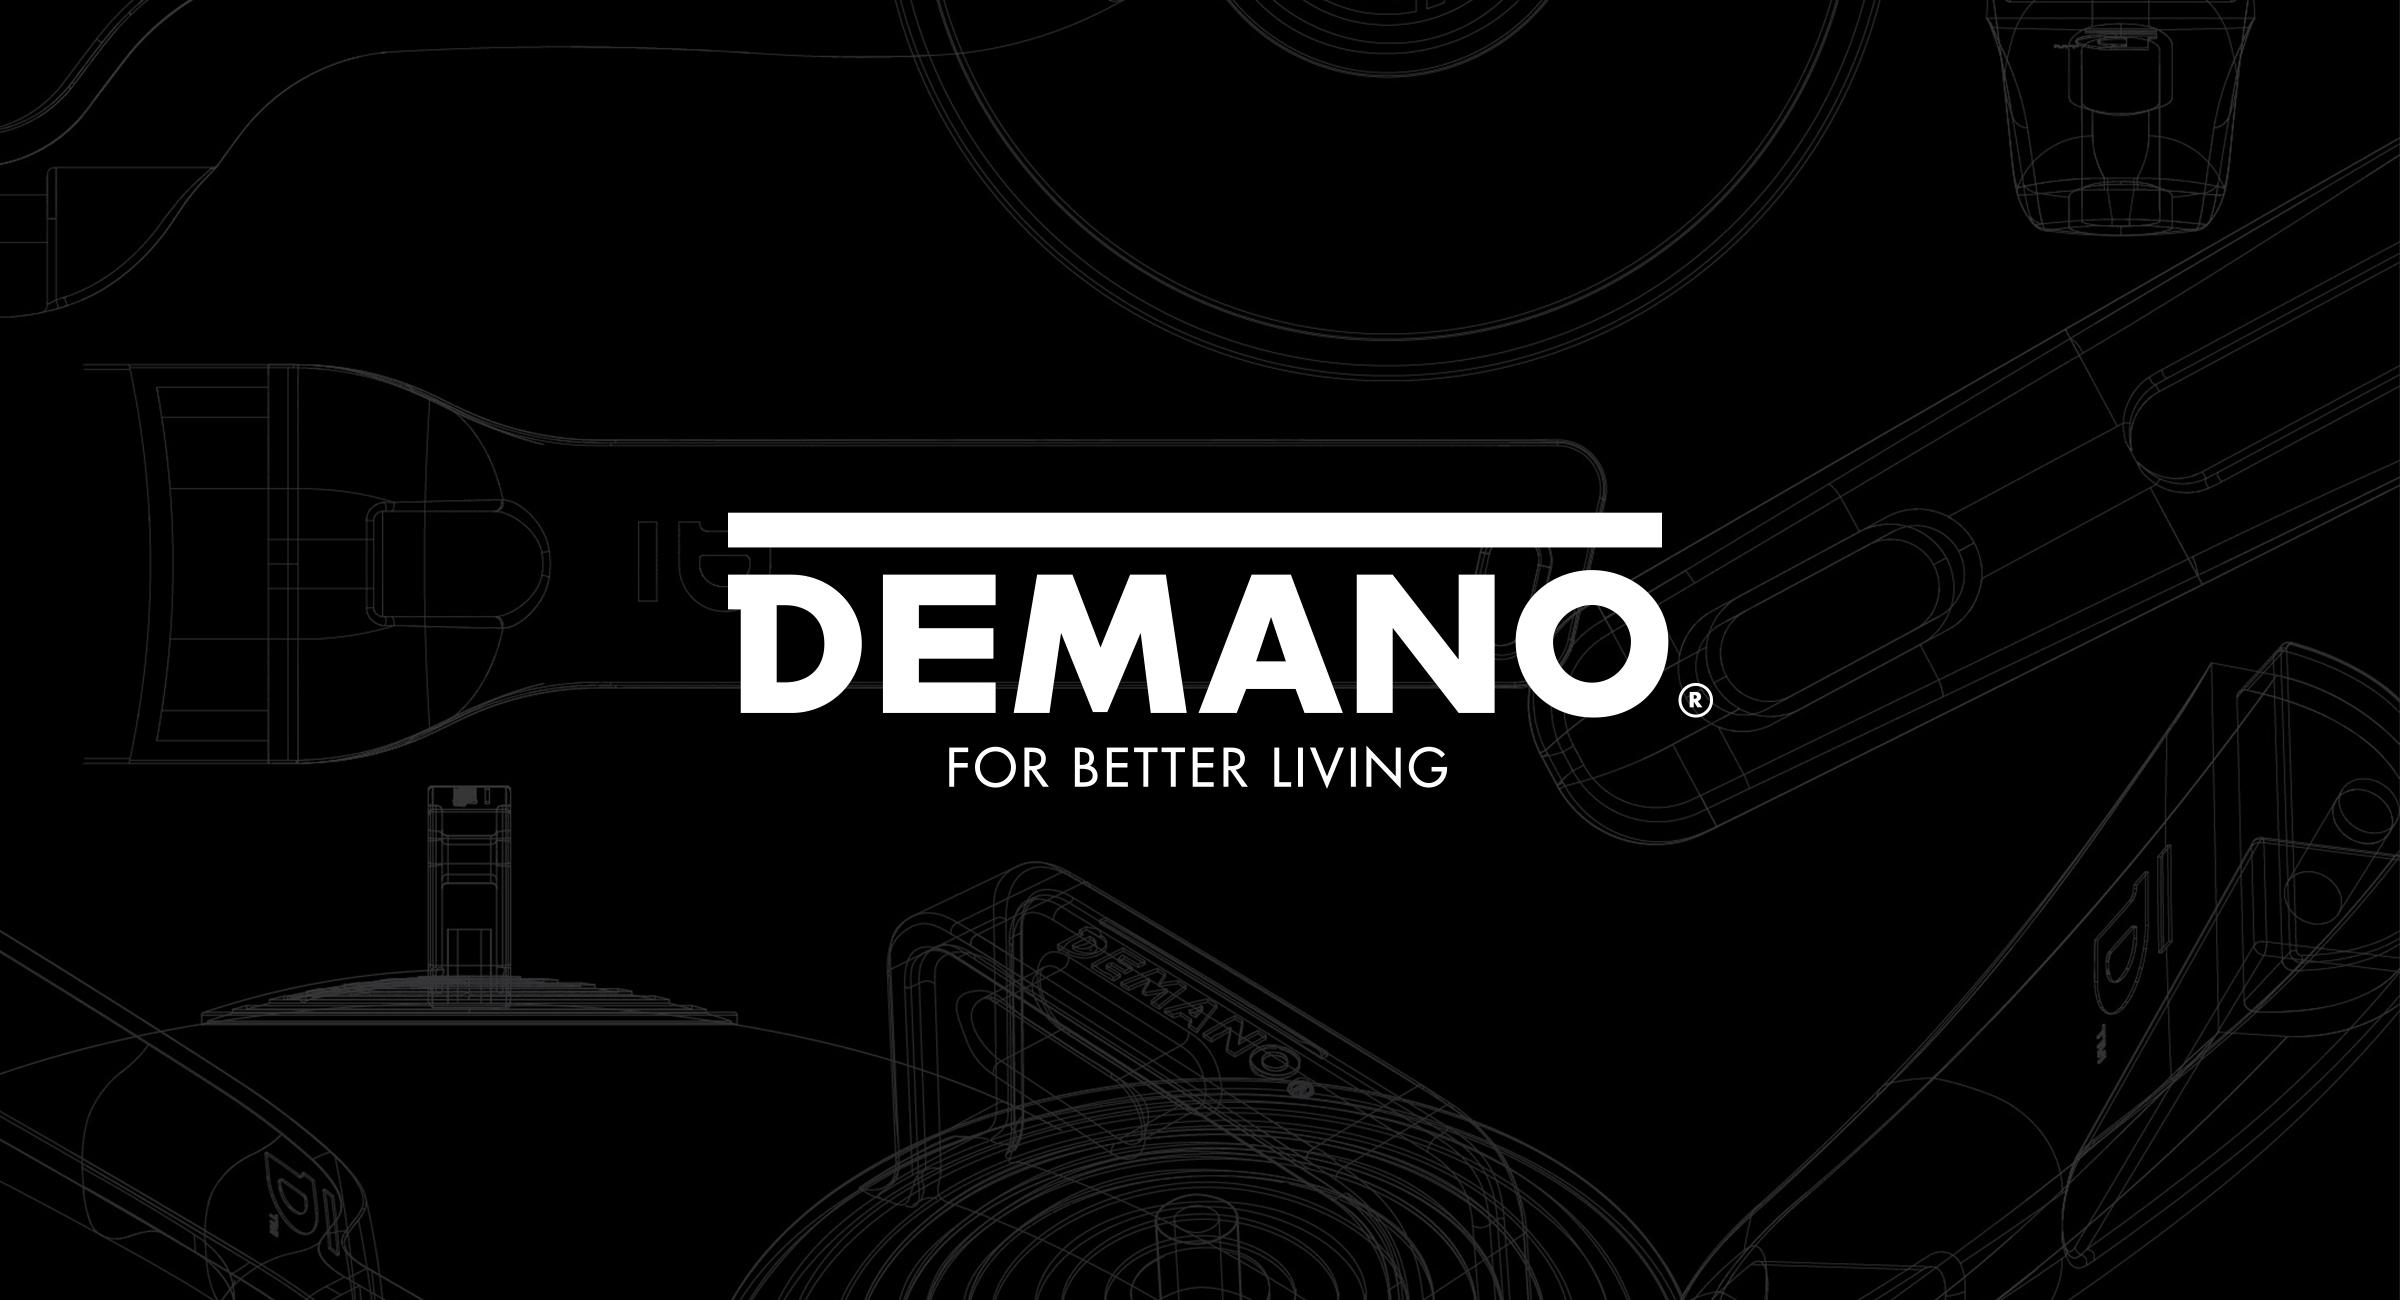 +Demano_01.jpg